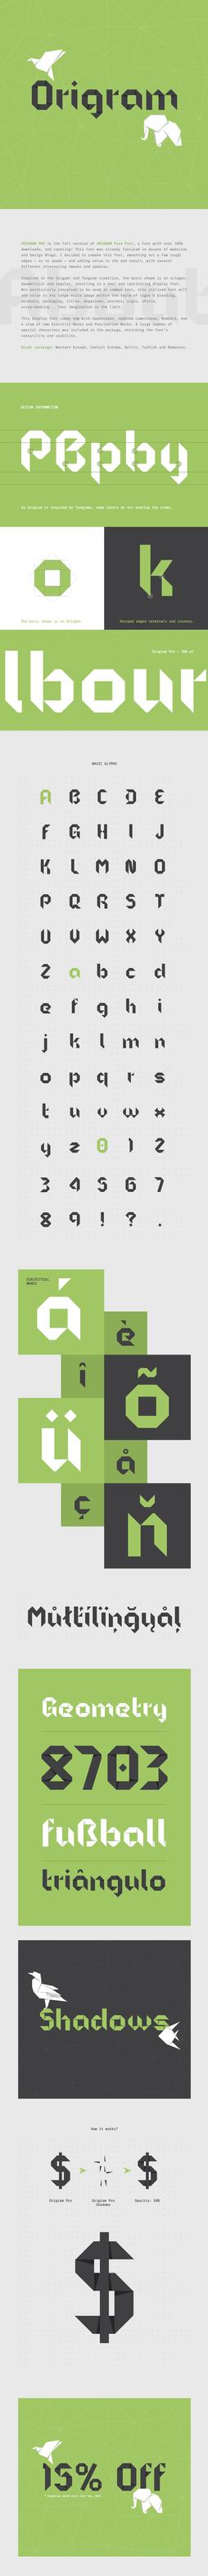 Origram Pro Font by NunoDias